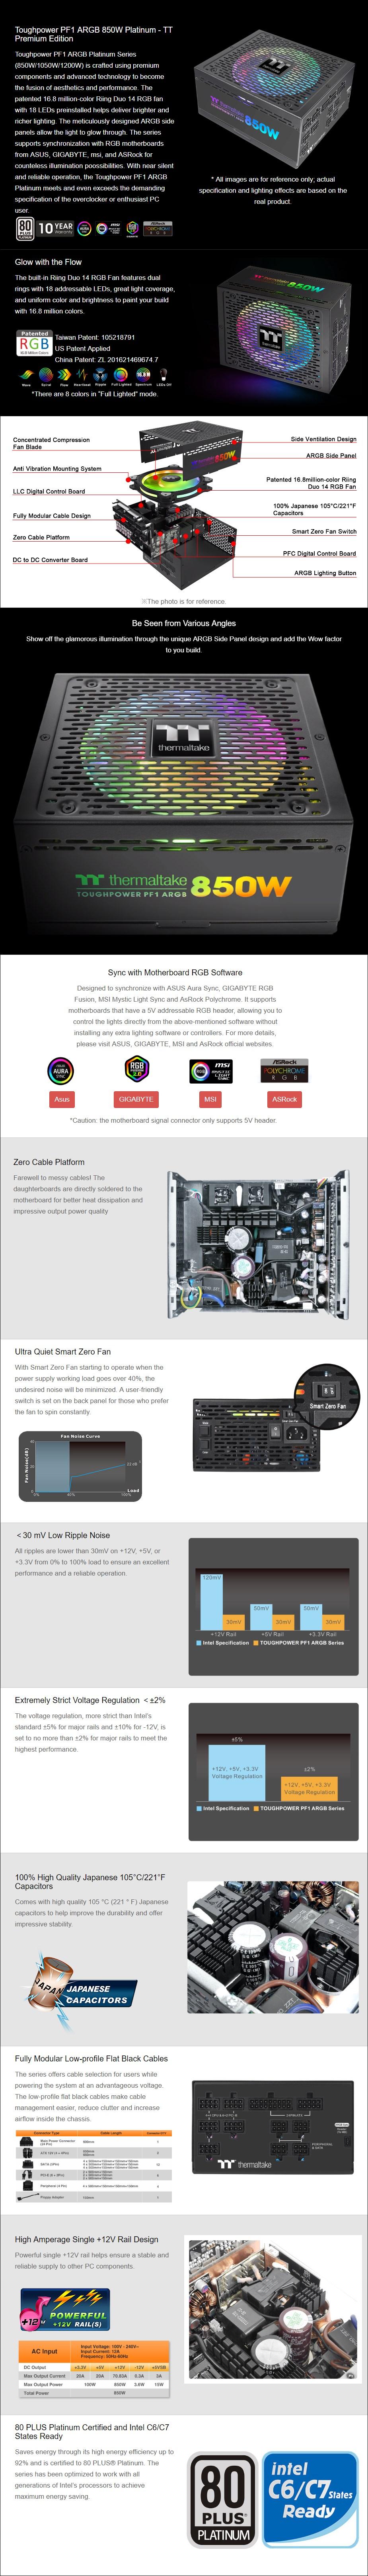 Thermaltake Toughpower PF1 ARGB 1200W 80+ Platinum Modular Power Supply - Overview 1